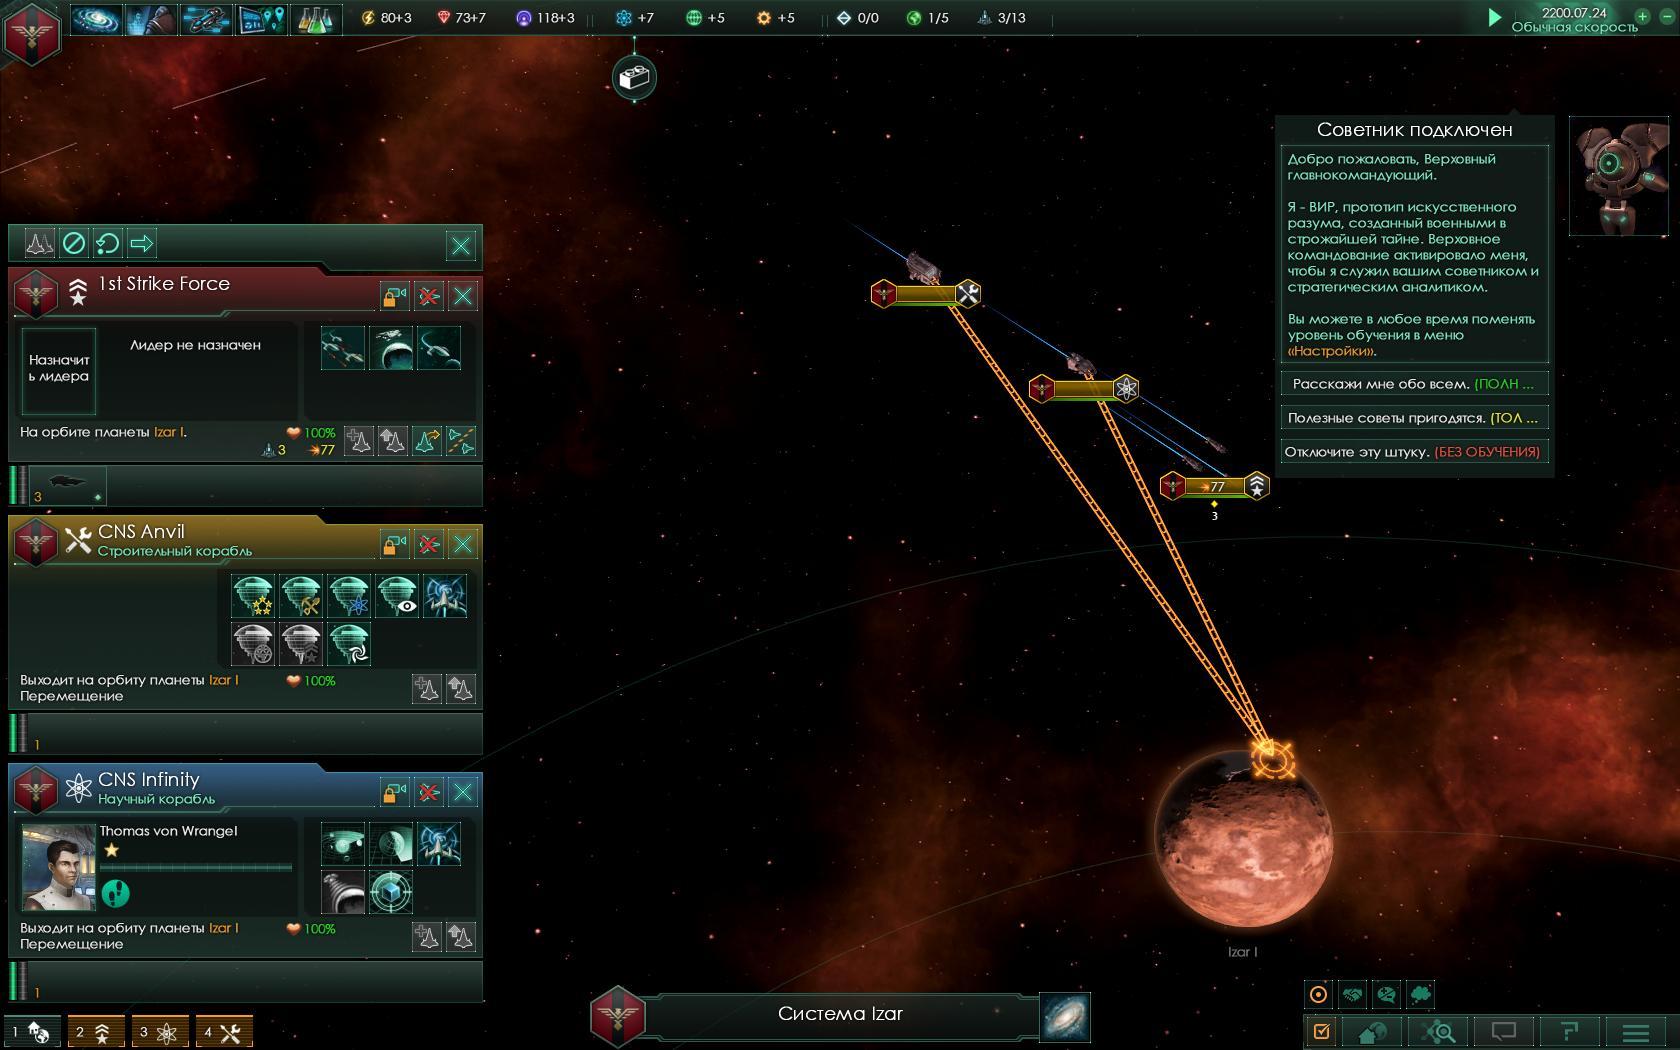 Скриншот Stellaris: Galaxy Edition [v 1.5.0 + 8 DLC] (2016) PC